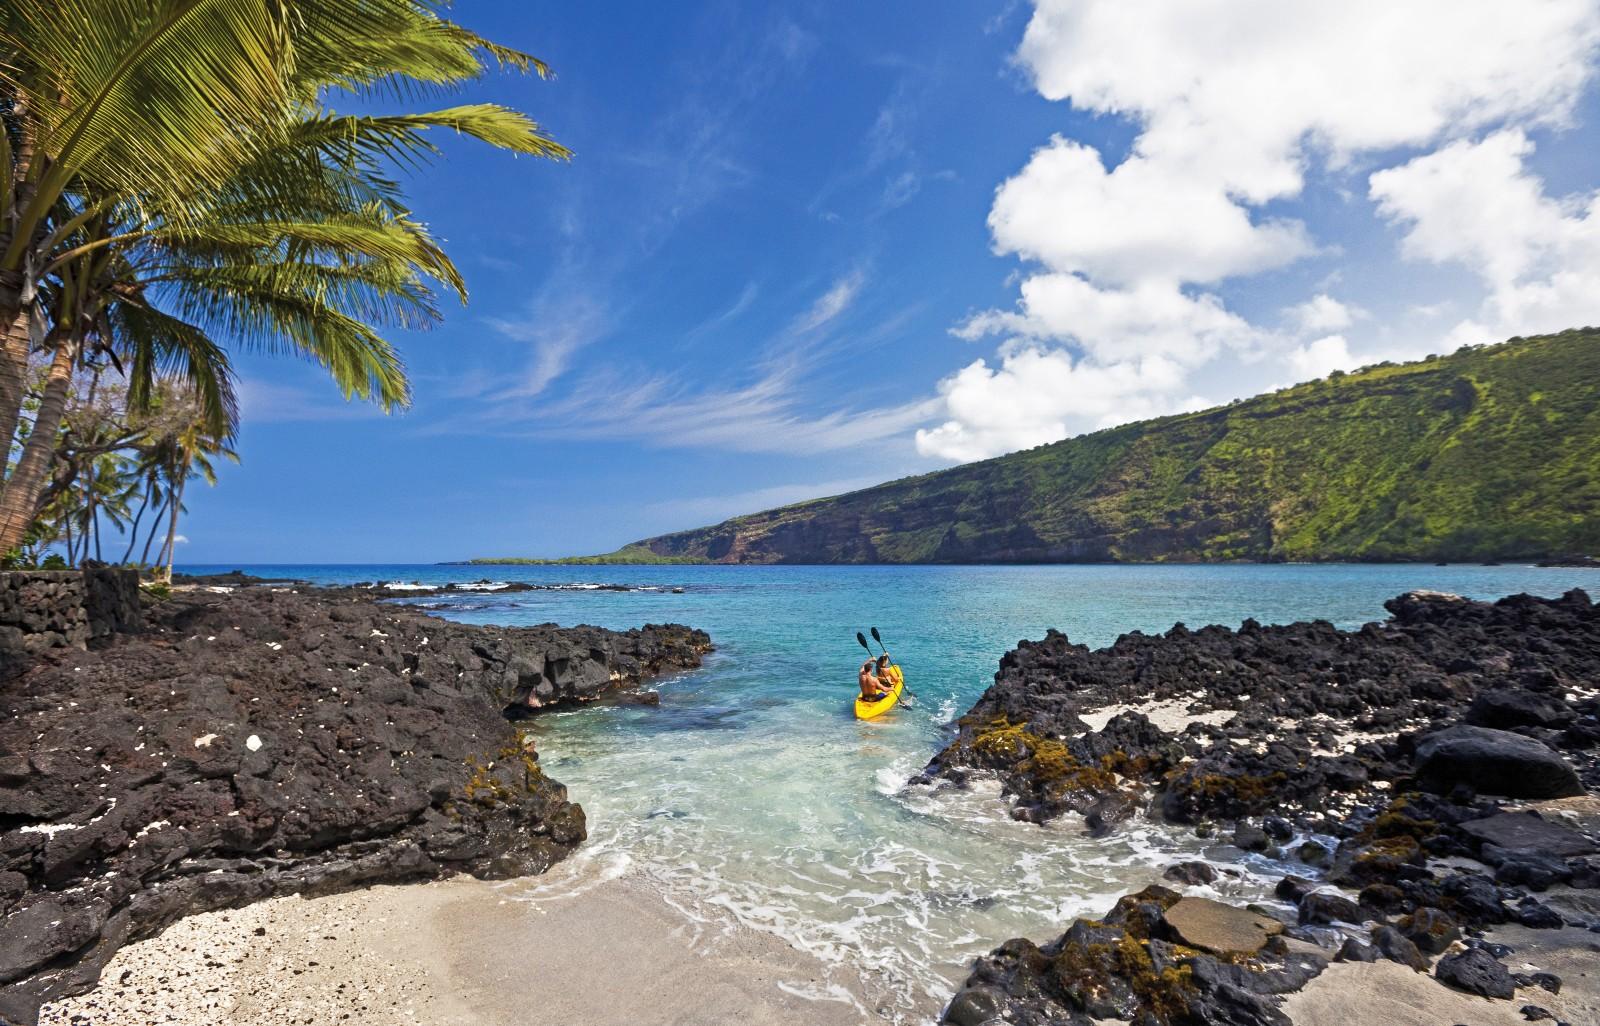 Kona Diving Company >> Sheraton Kona Resort & Spa - Reef and Rainforest